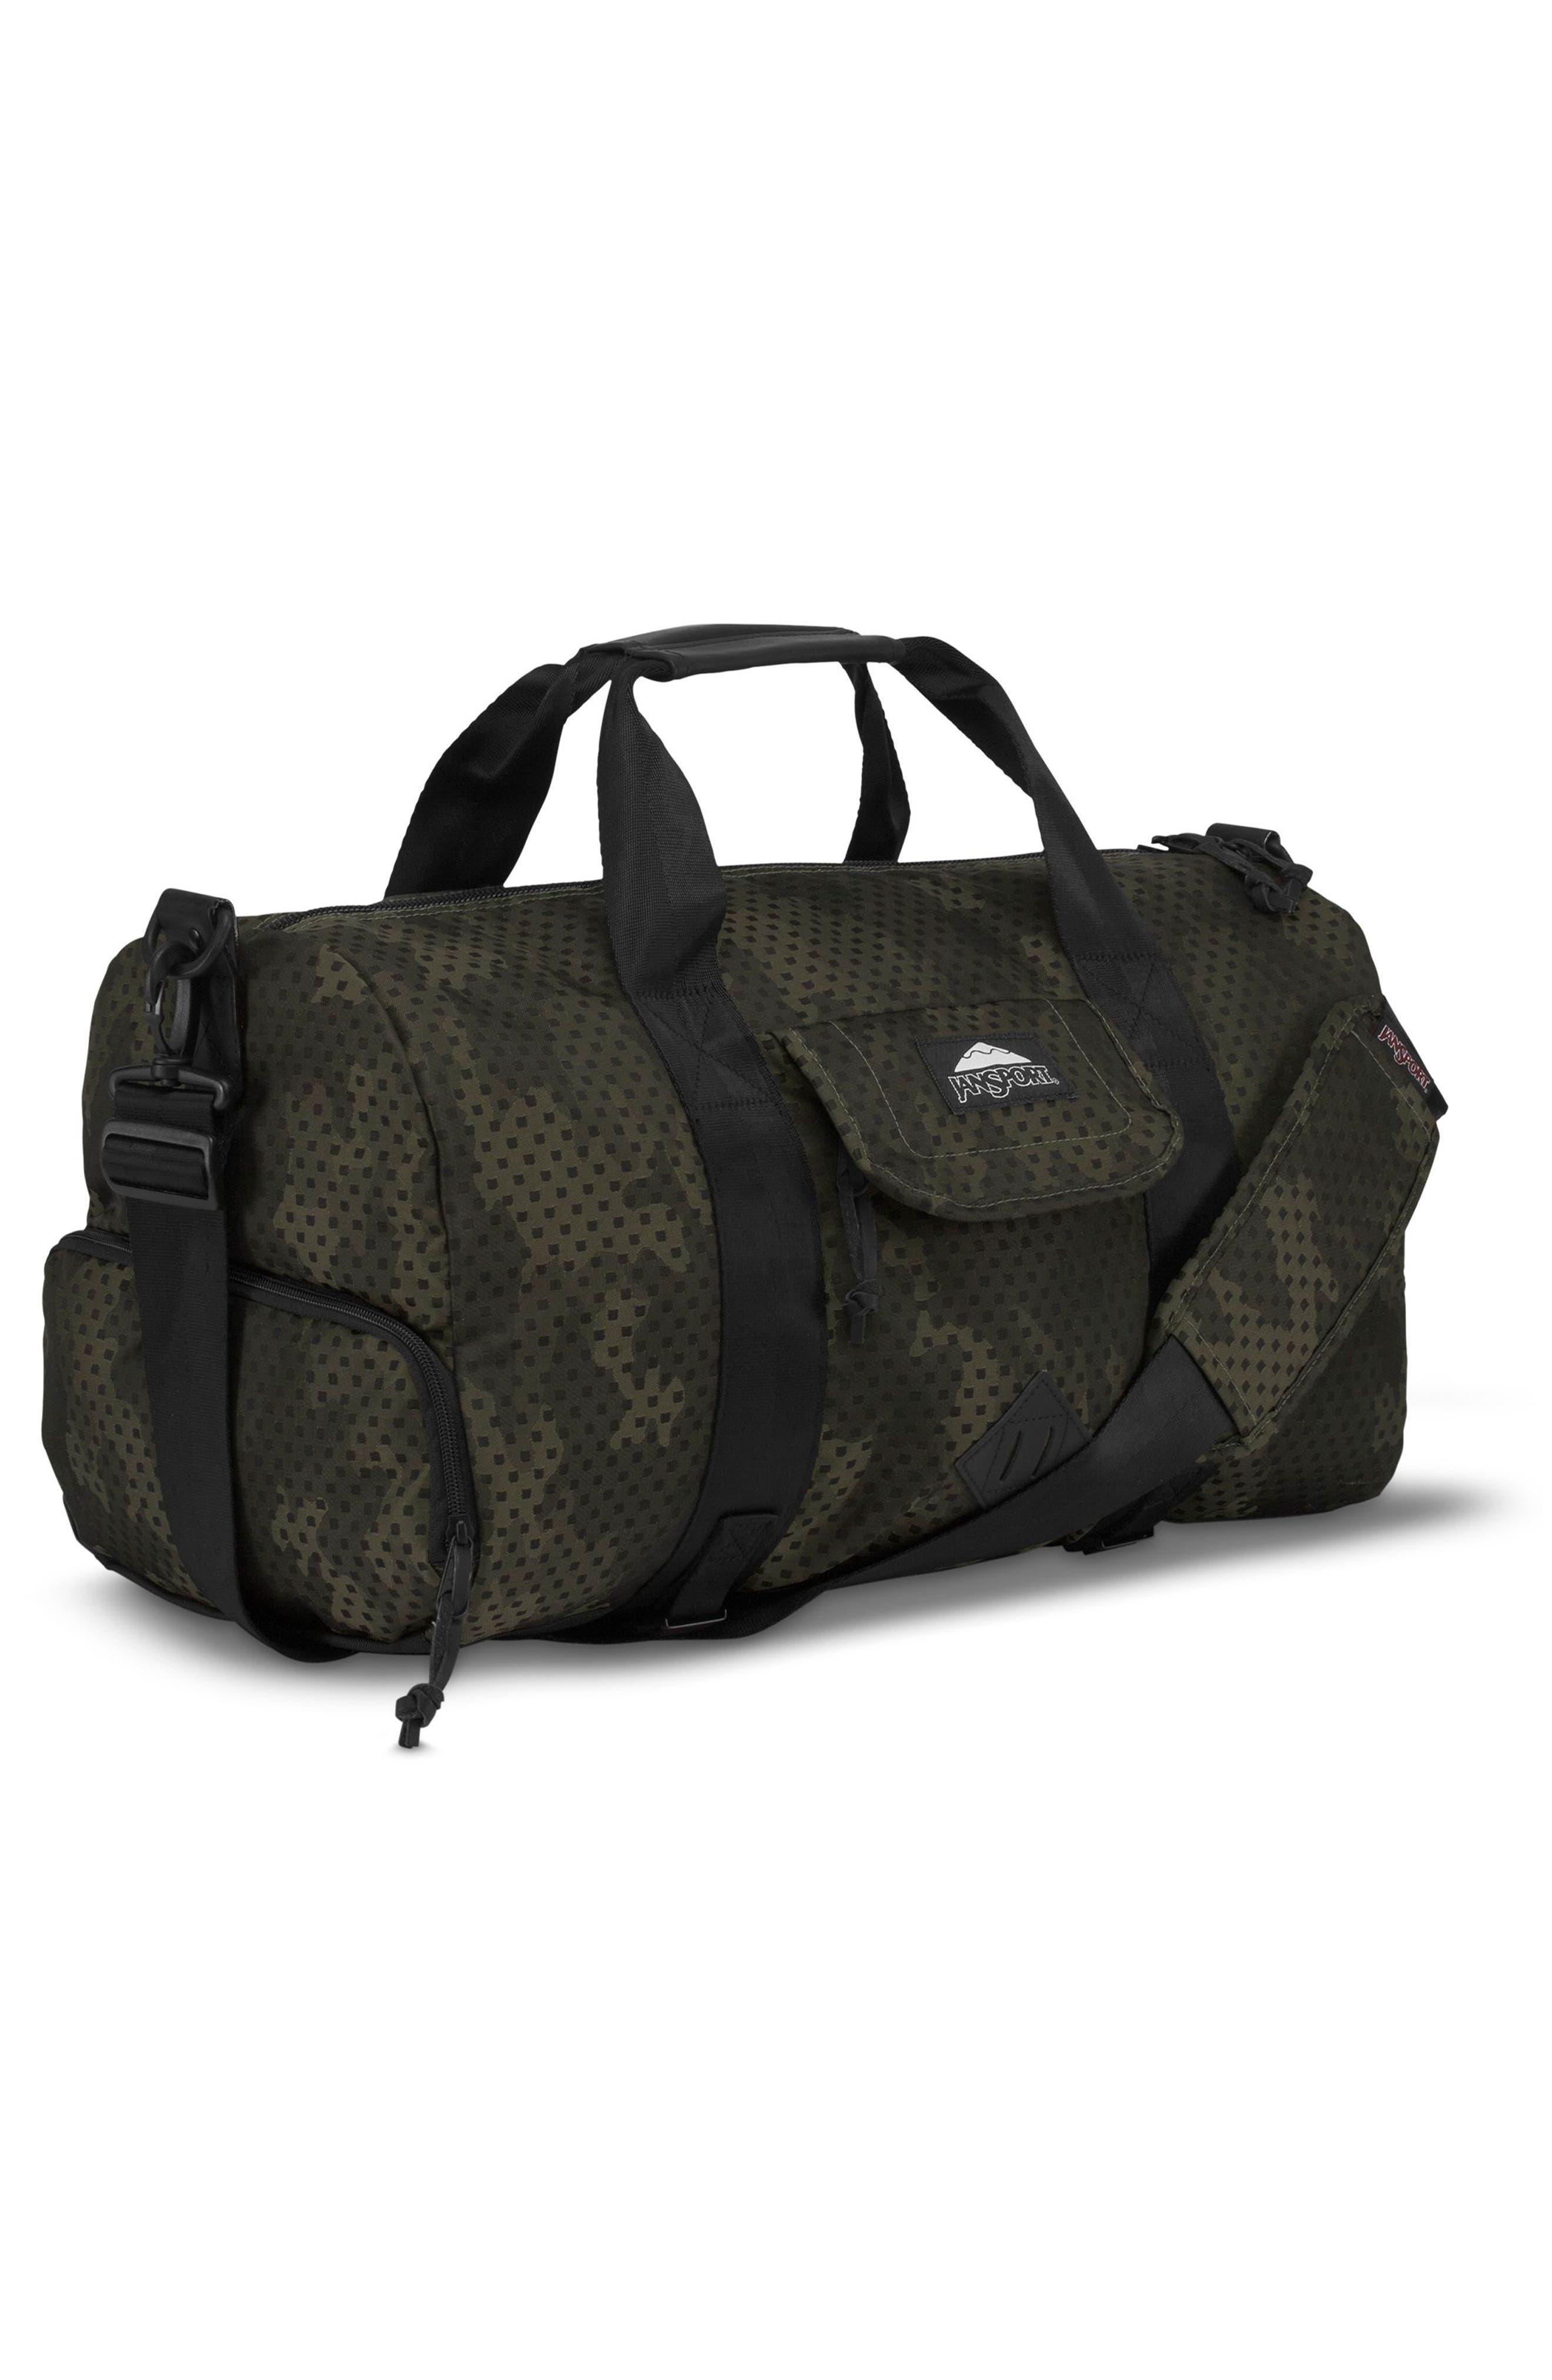 Wayward Duffel Bag,                             Alternate thumbnail 4, color,                             Green Square Camo